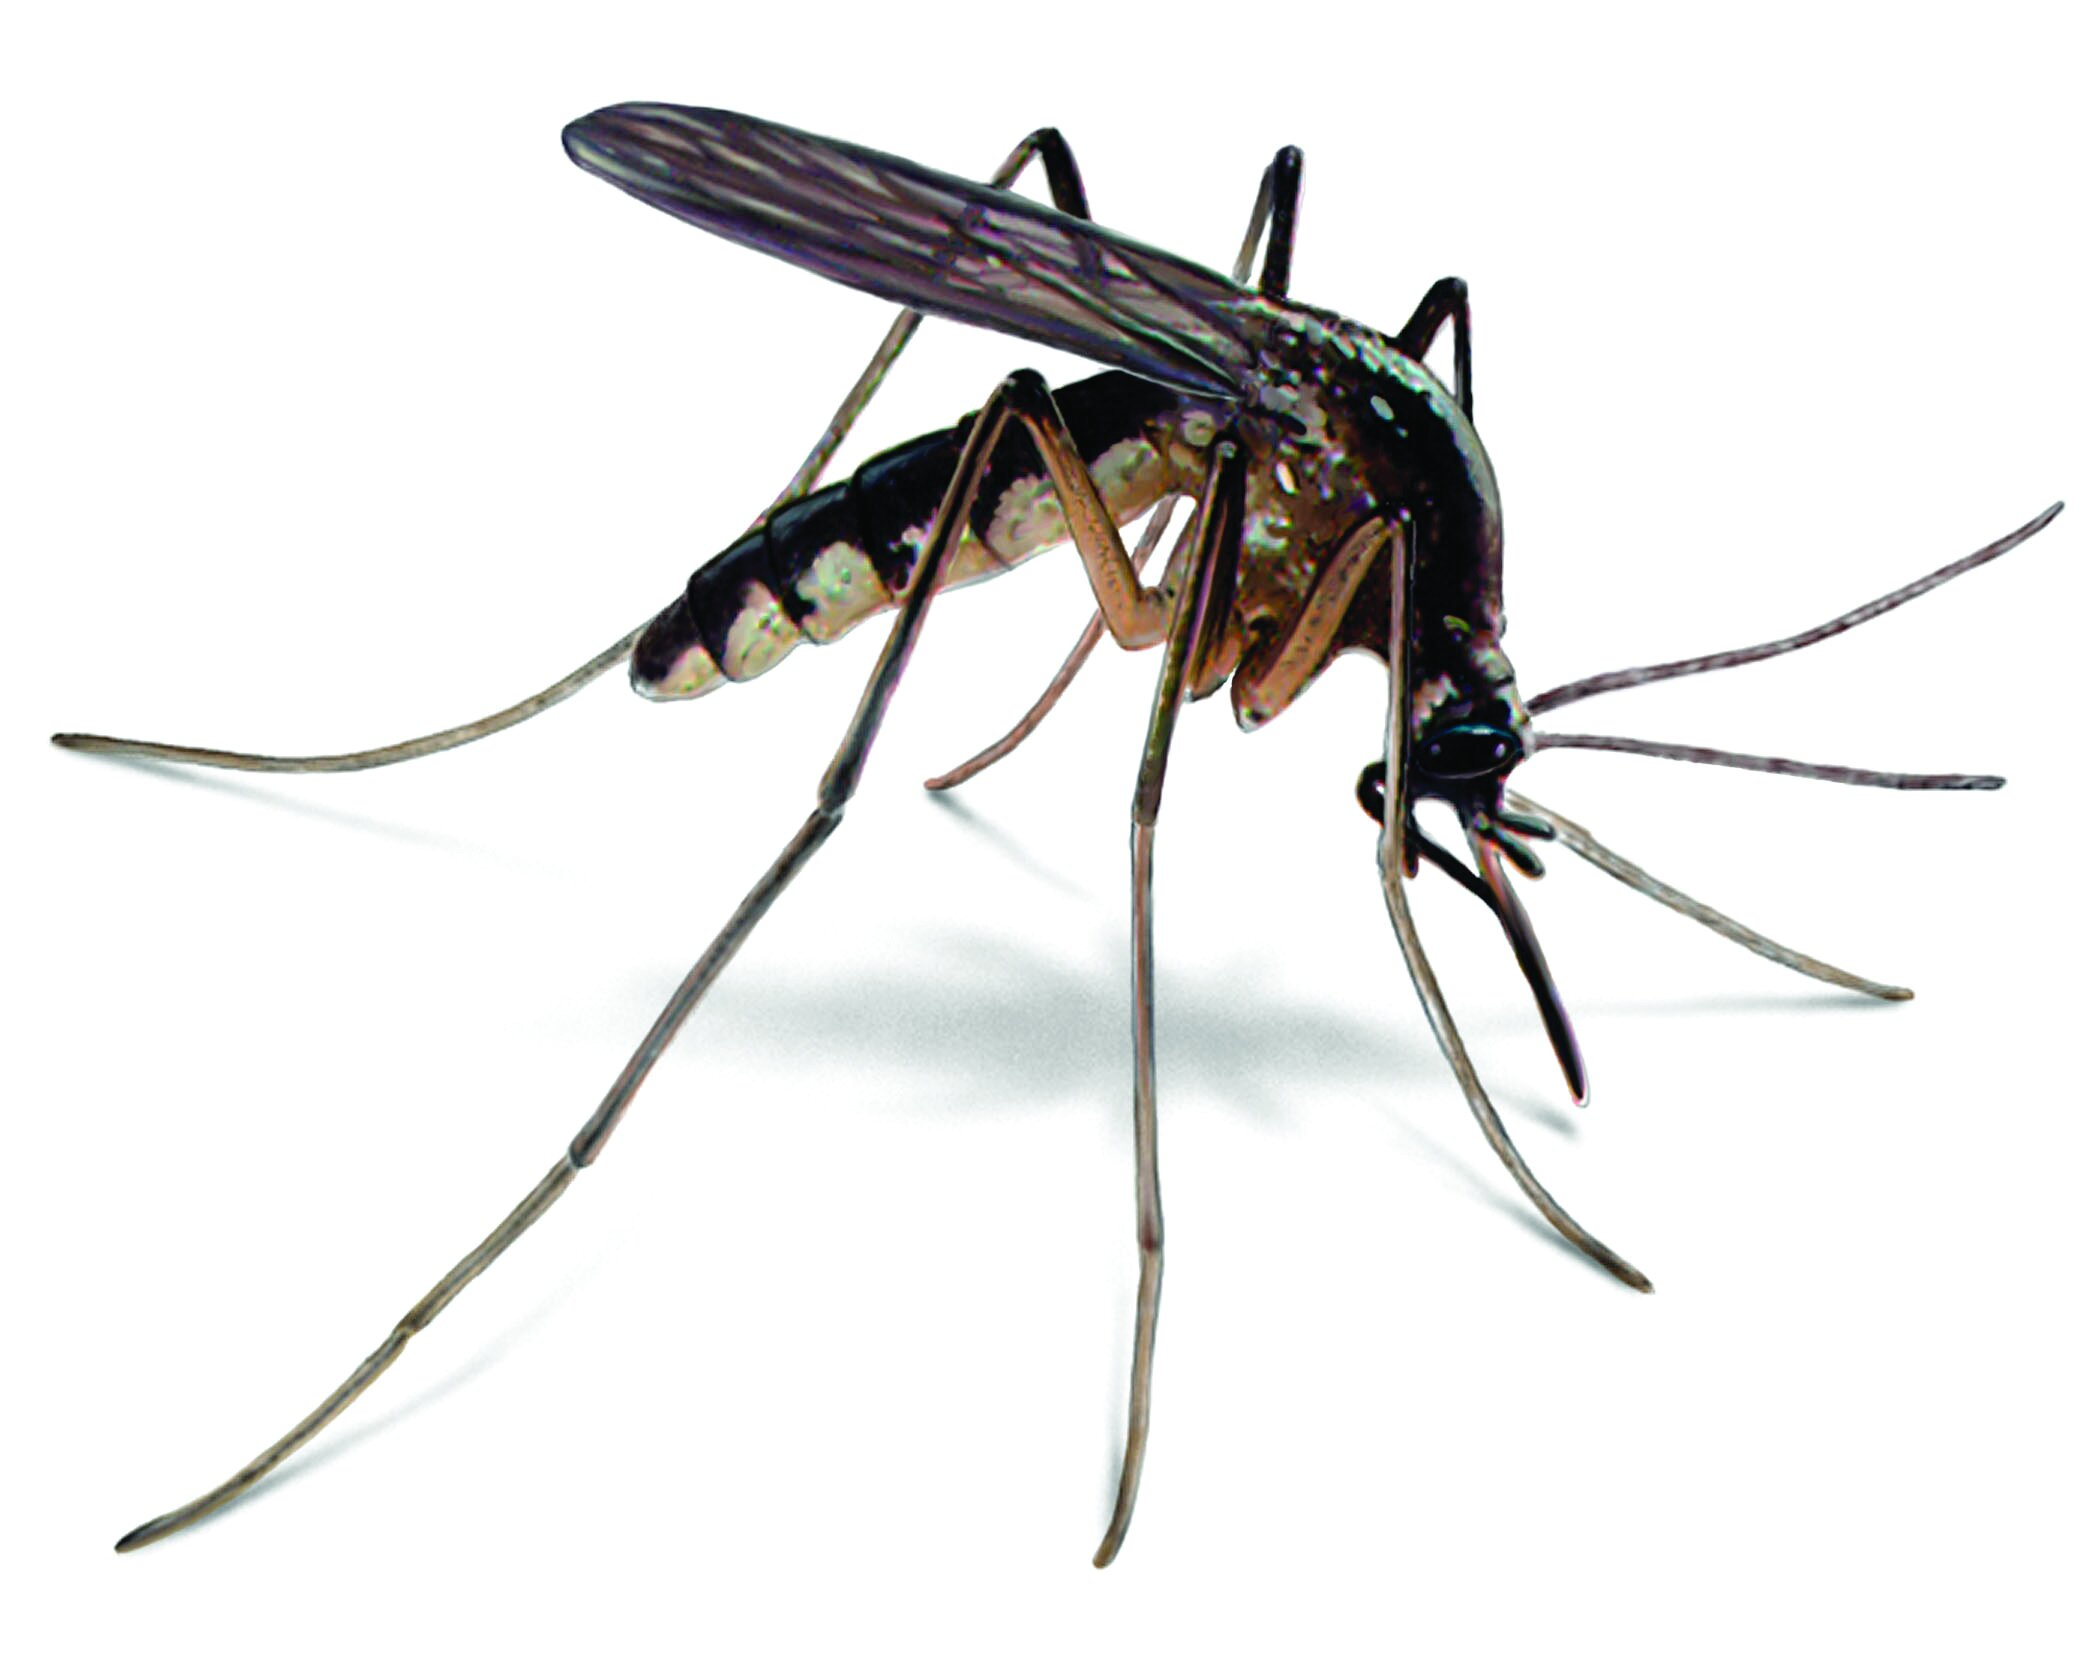 mosquito-illustration_2092x1660.jpg